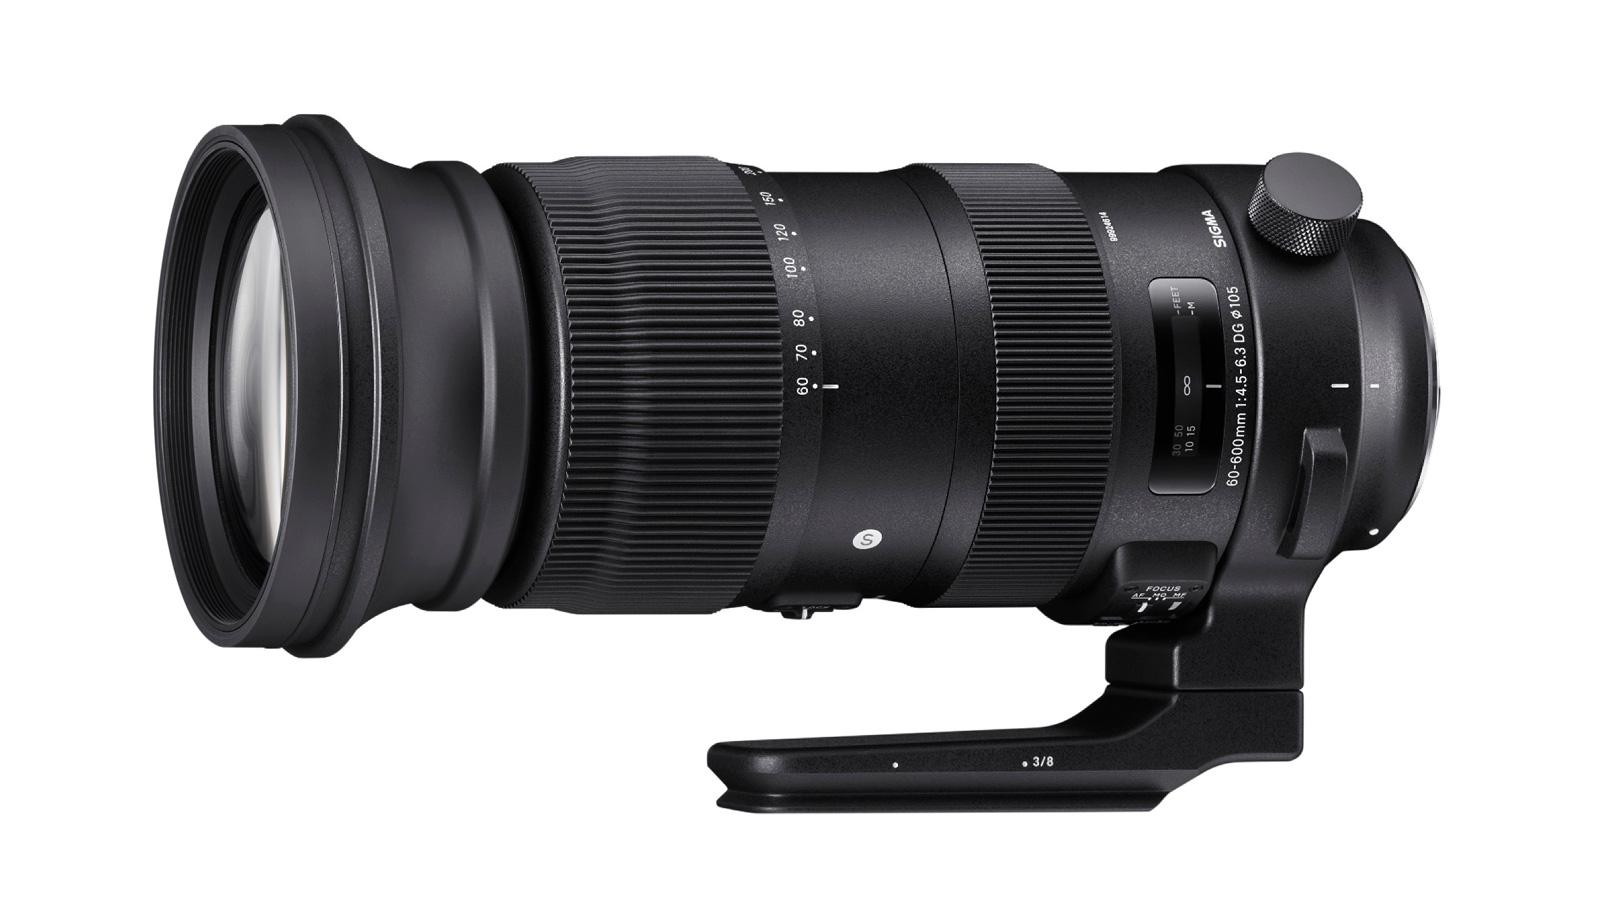 Sigma Announces 5 New Lenses at Photokina 2018